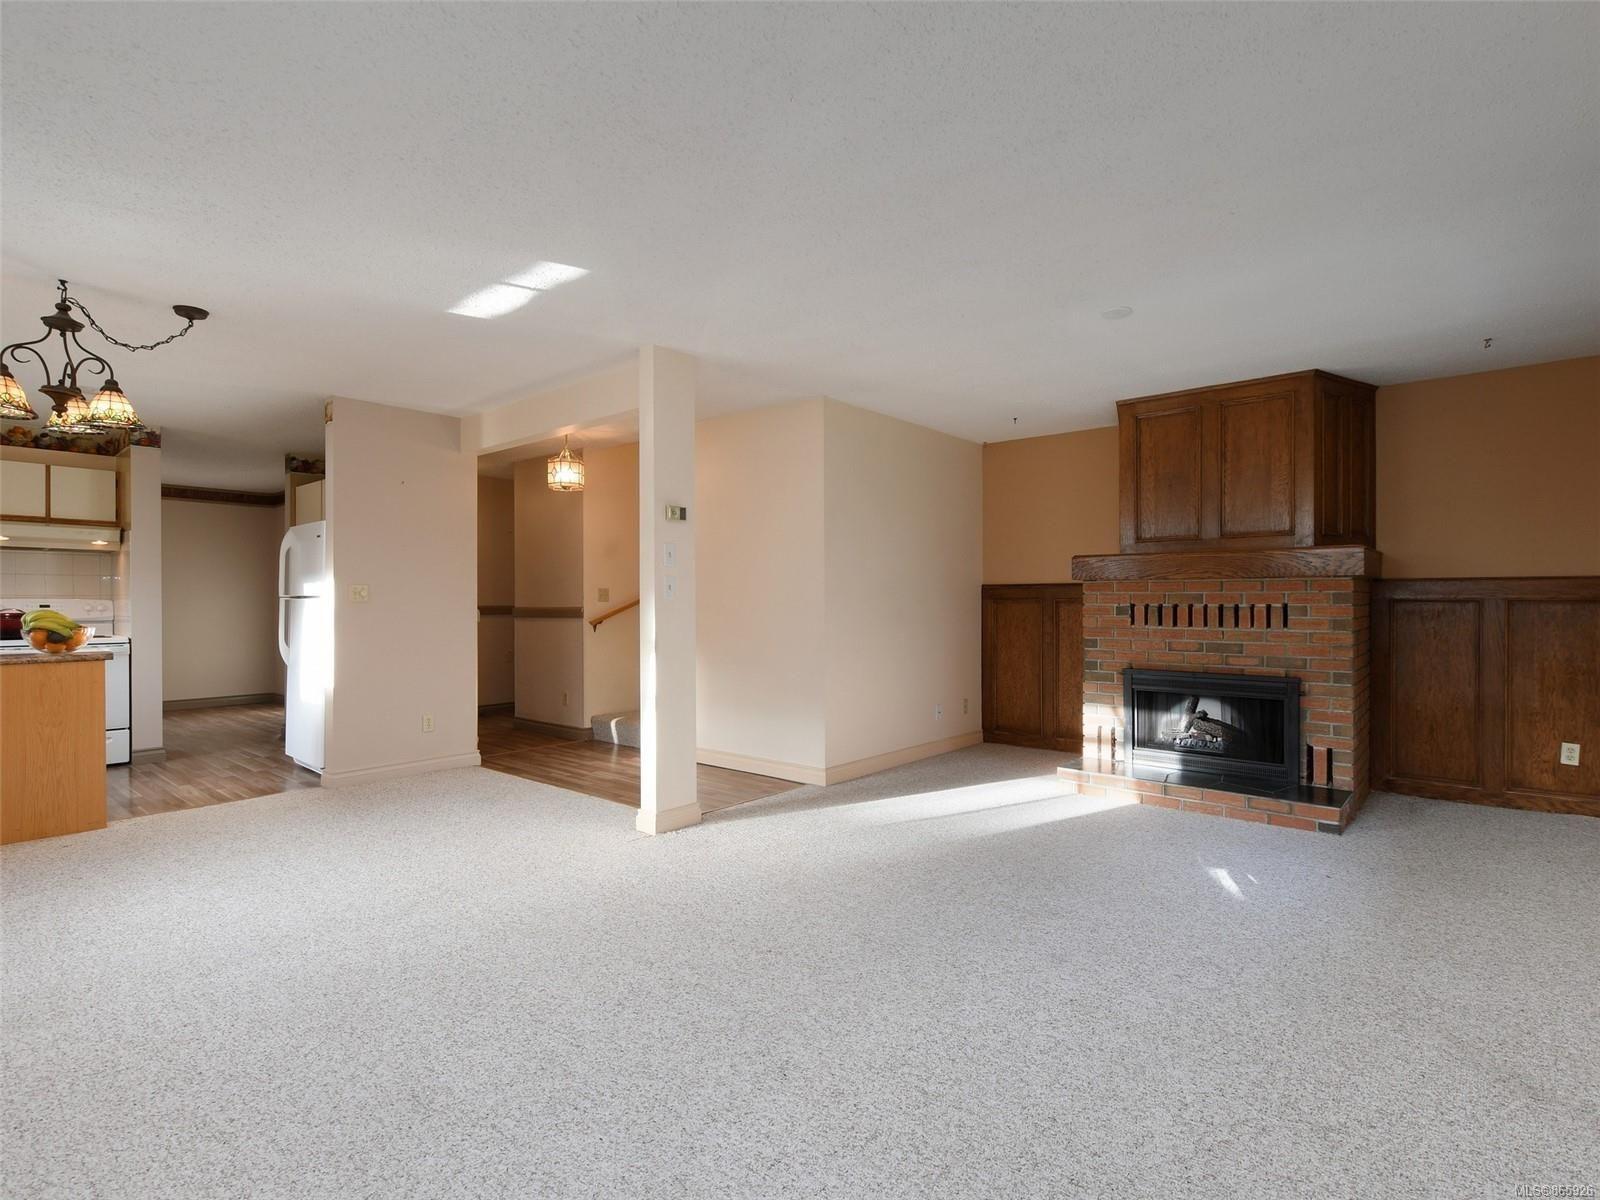 Photo 2: Photos: 8 4350 West Saanich Rd in : SW Royal Oak Row/Townhouse for sale (Saanich West)  : MLS®# 865926